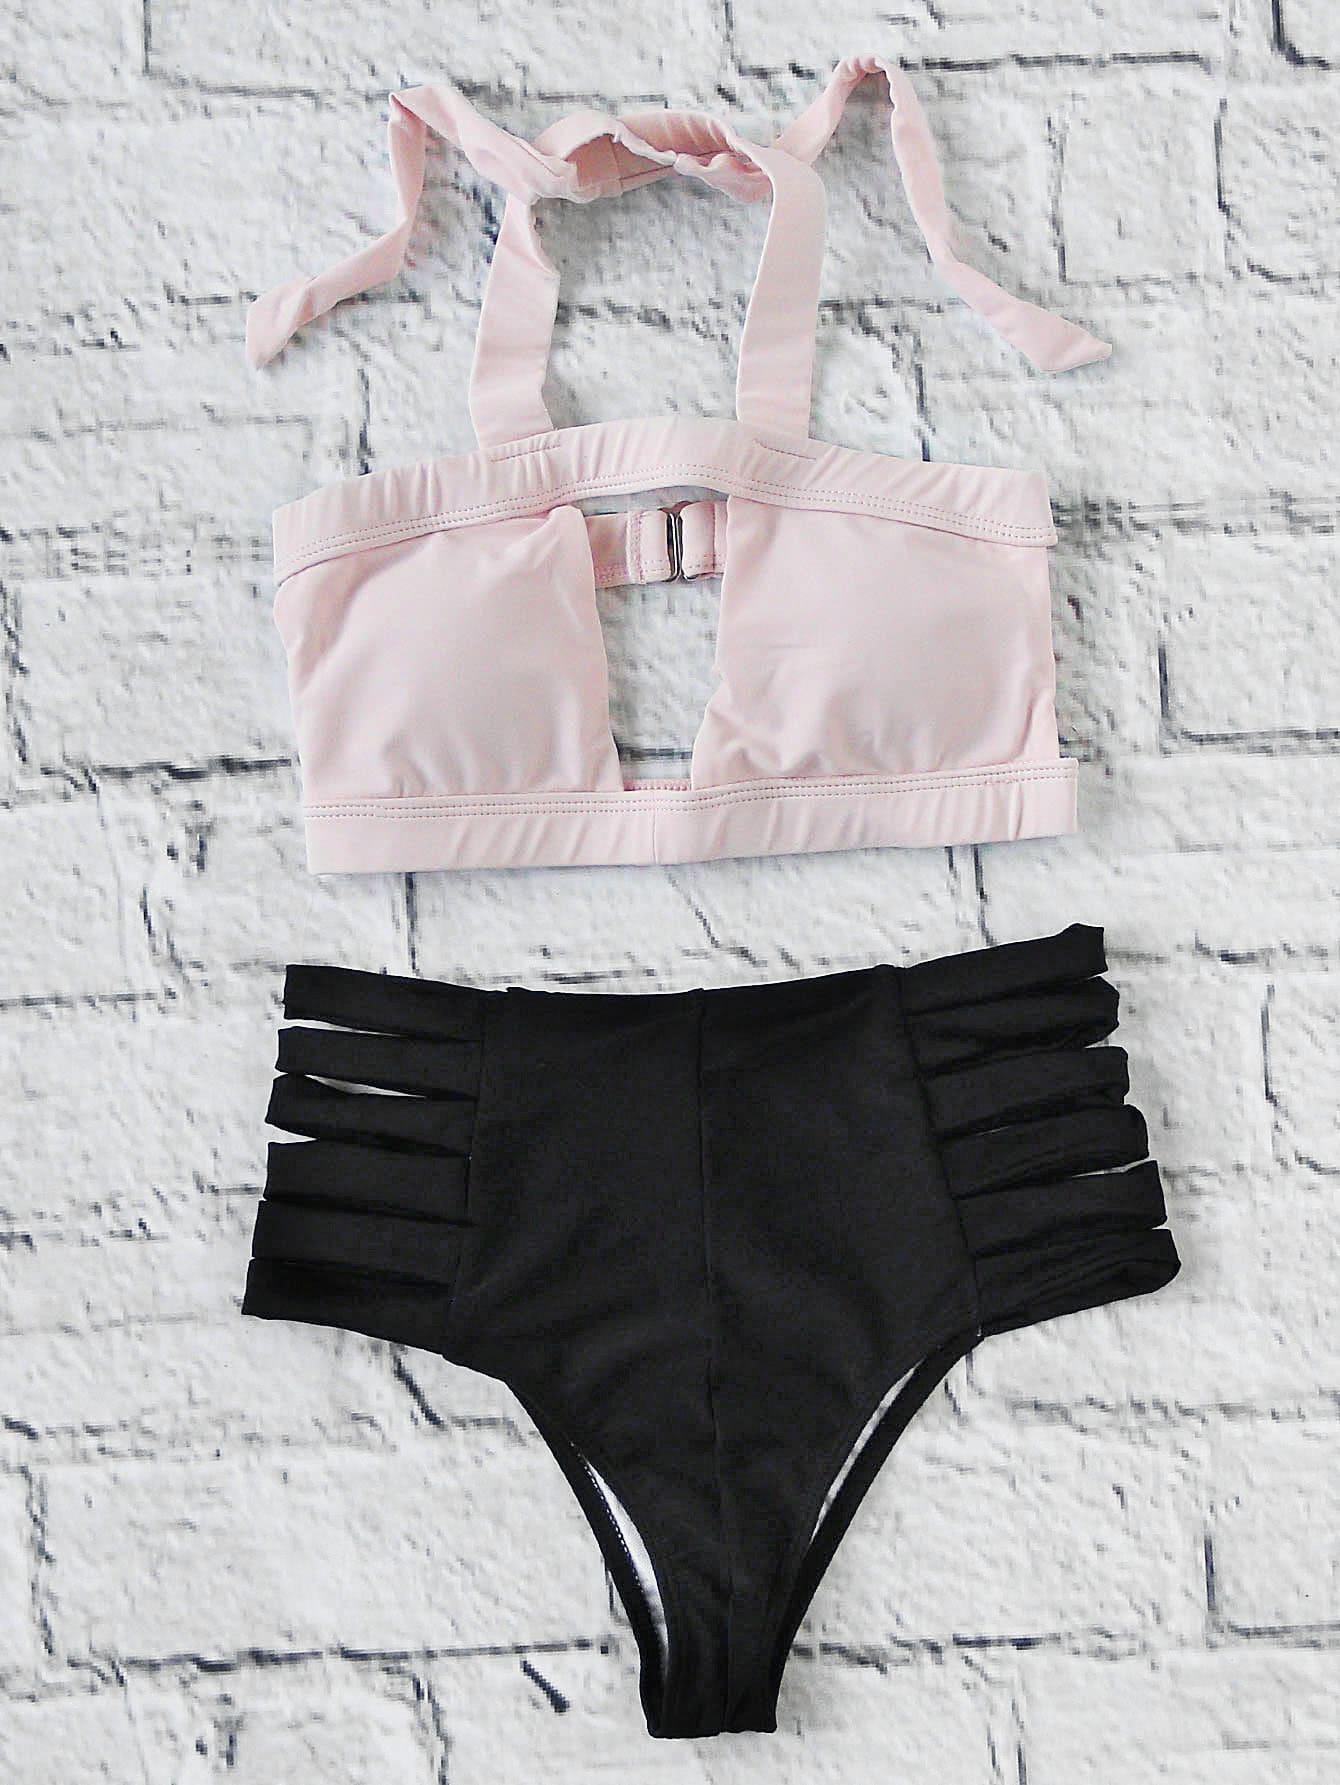 Two Tone Ladder Cutout High Waist Bikini Set swimwear170411307